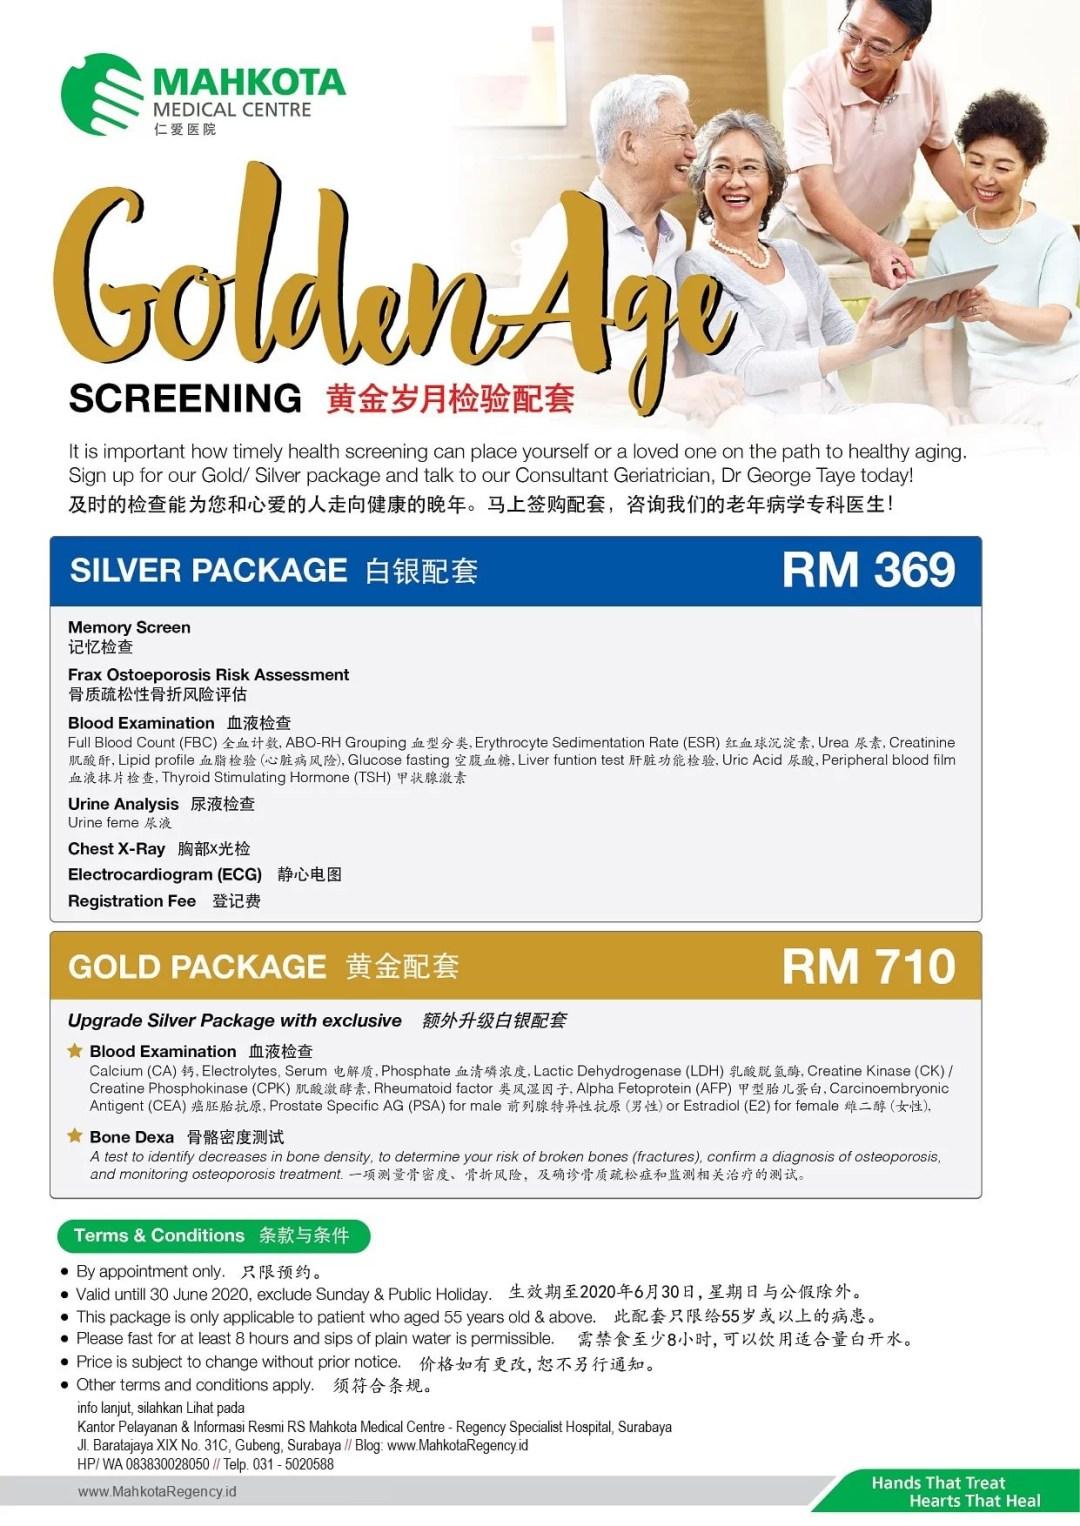 Promo Paket Pemeriksaan Lanjut Usia (Mahkota Medical Centre) 1